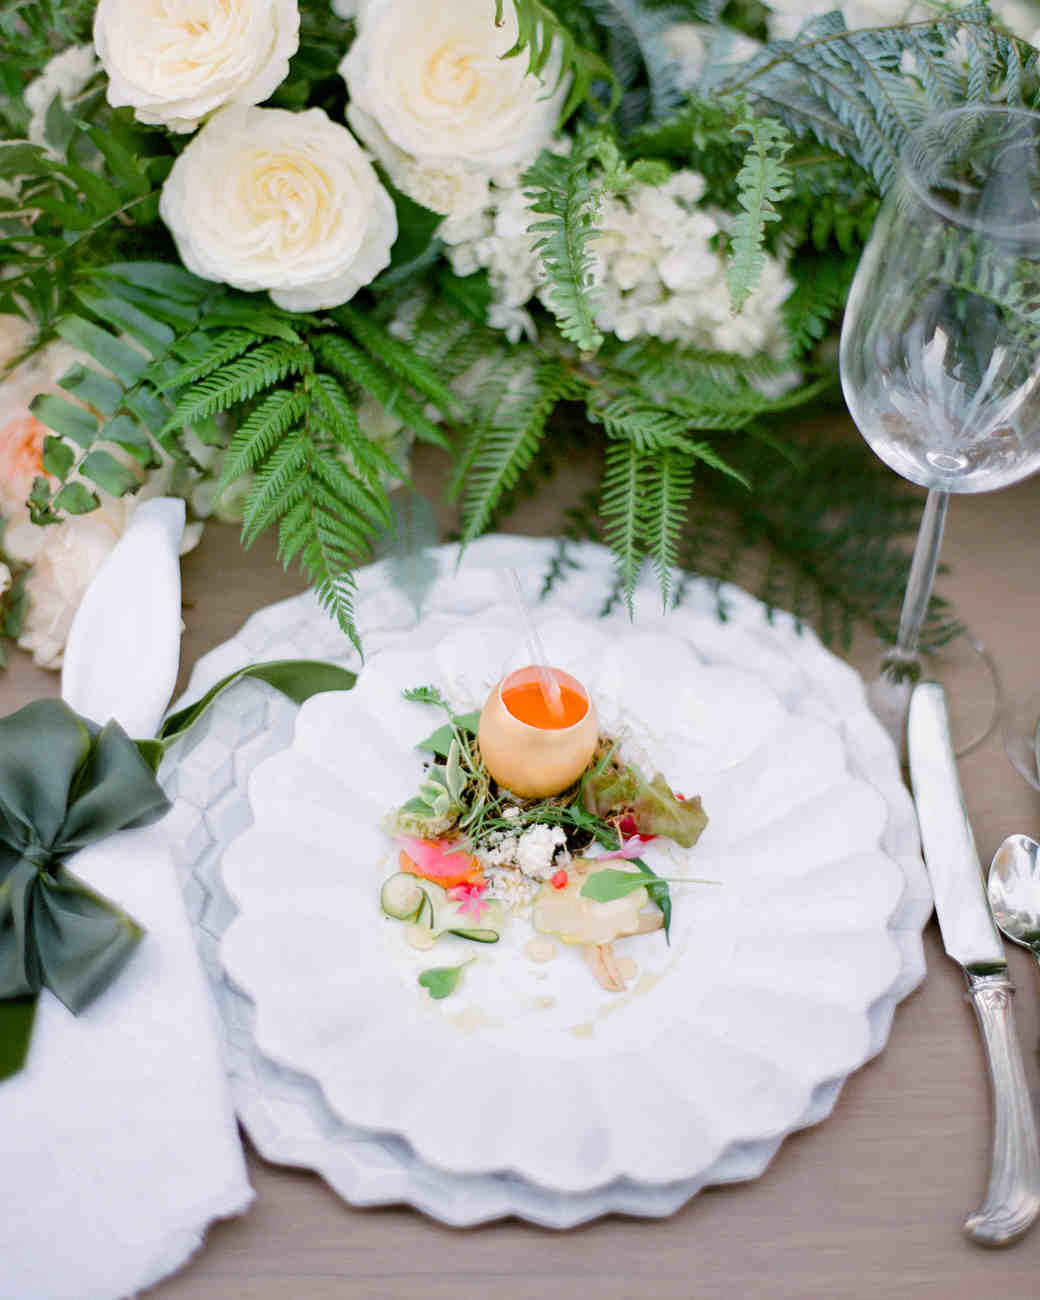 lily-jonathan-wedding-california-65810010-s112482.jpg